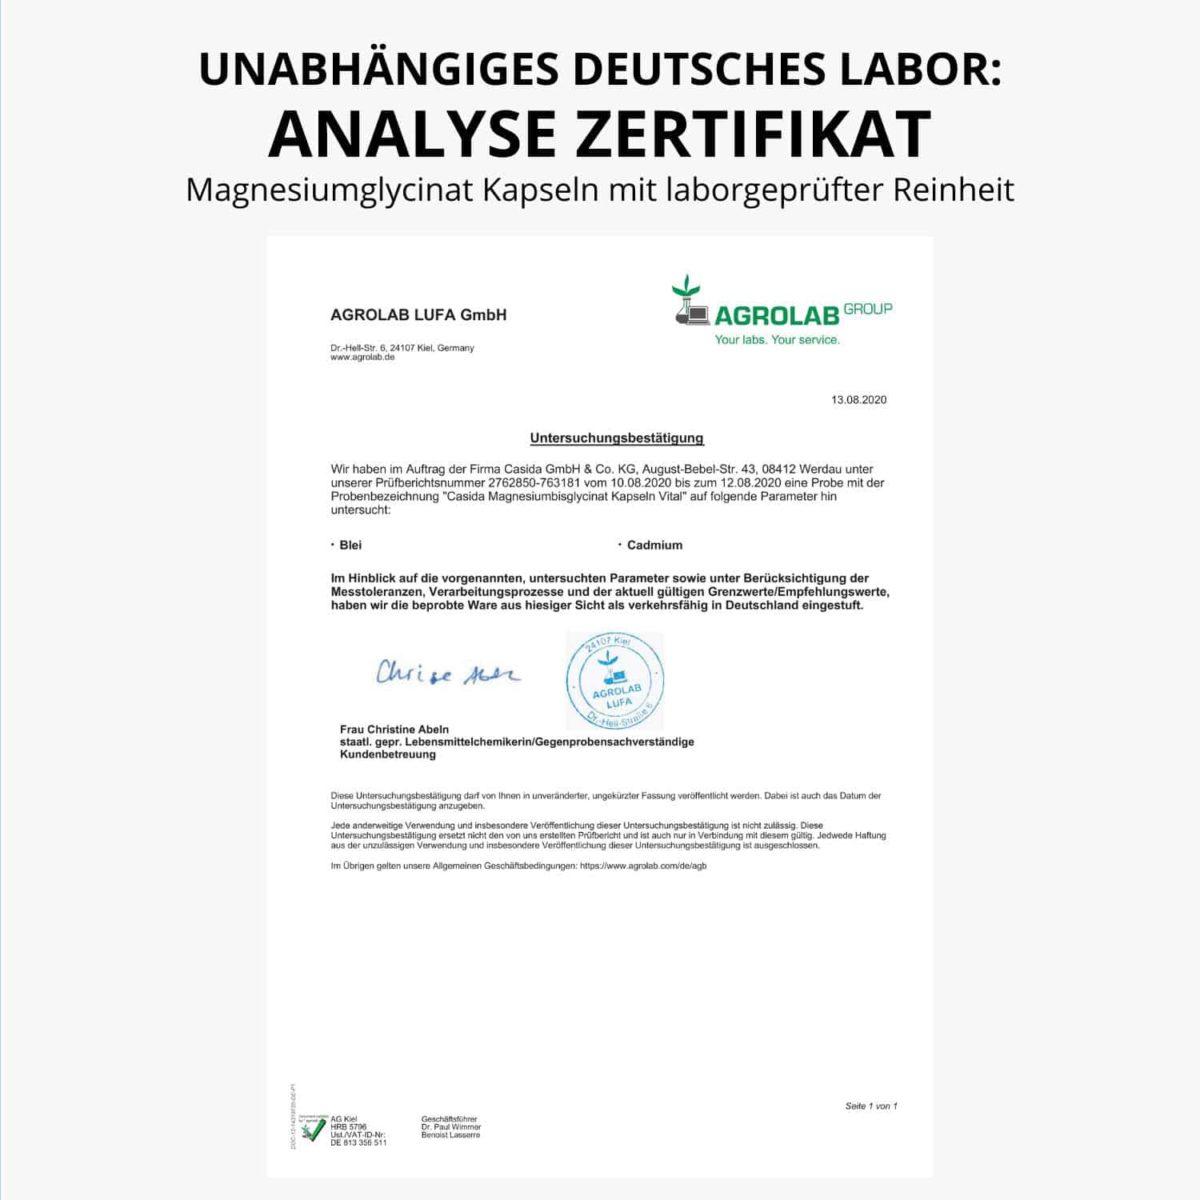 Magnesium Glycinate Capsules Vital – 120 Stk. 14362480 PZN Apotheke Bioverfügbarkeit organisches Magnesium8